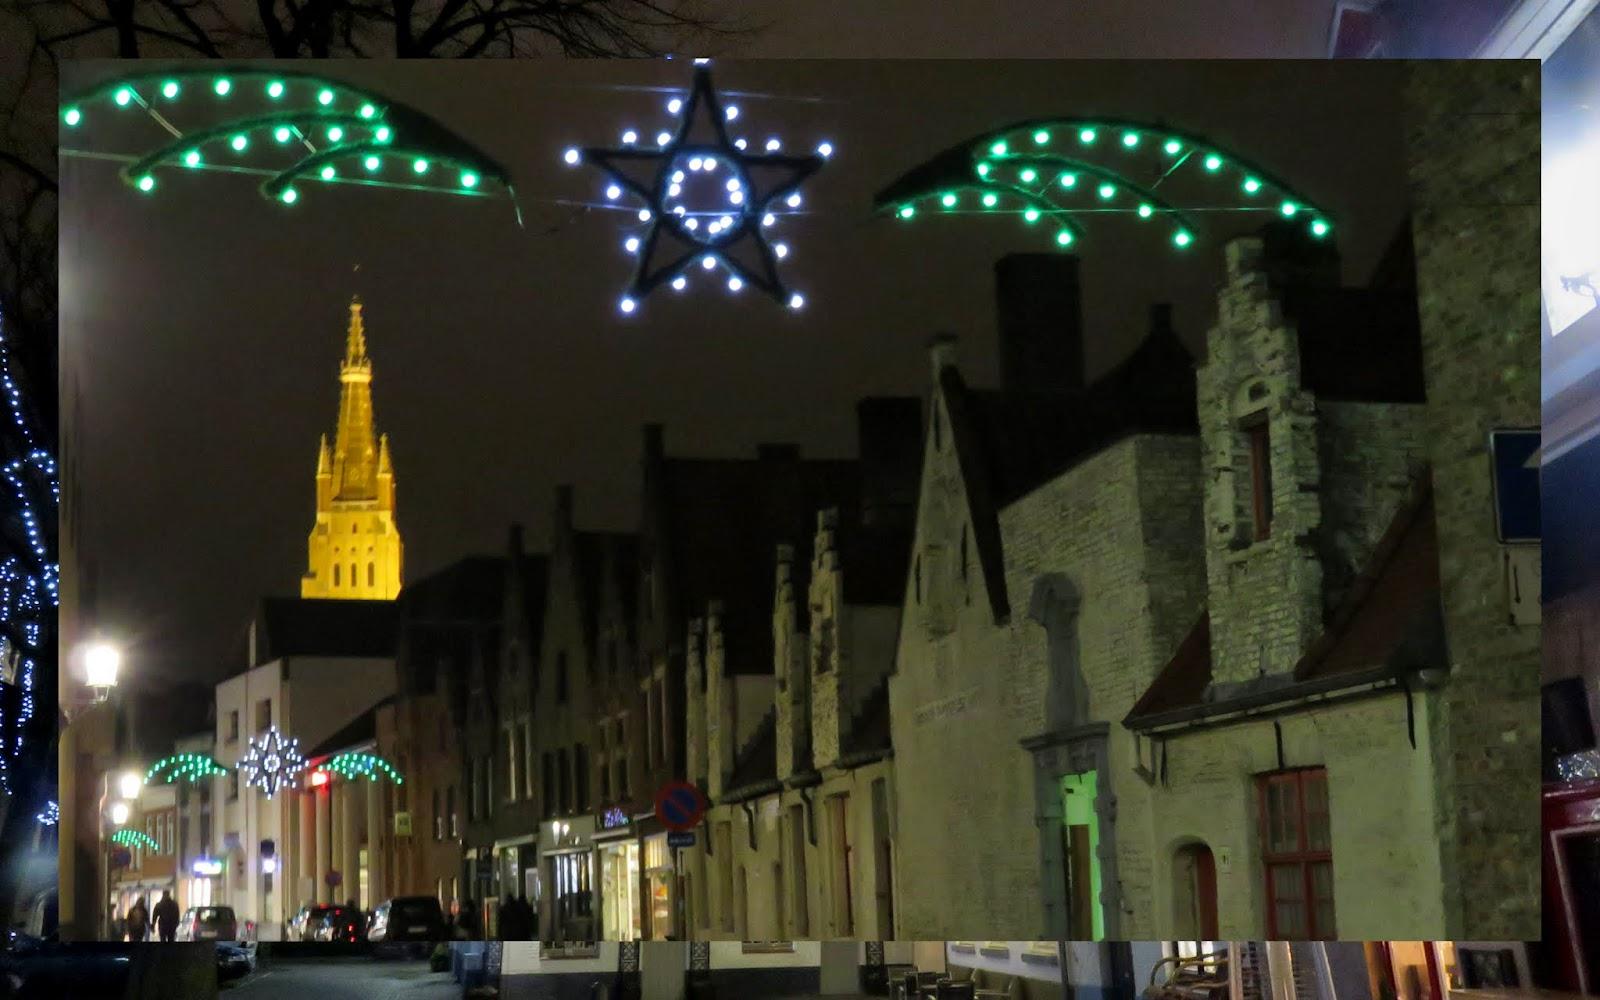 Christmas lights in Bruges, Belgium